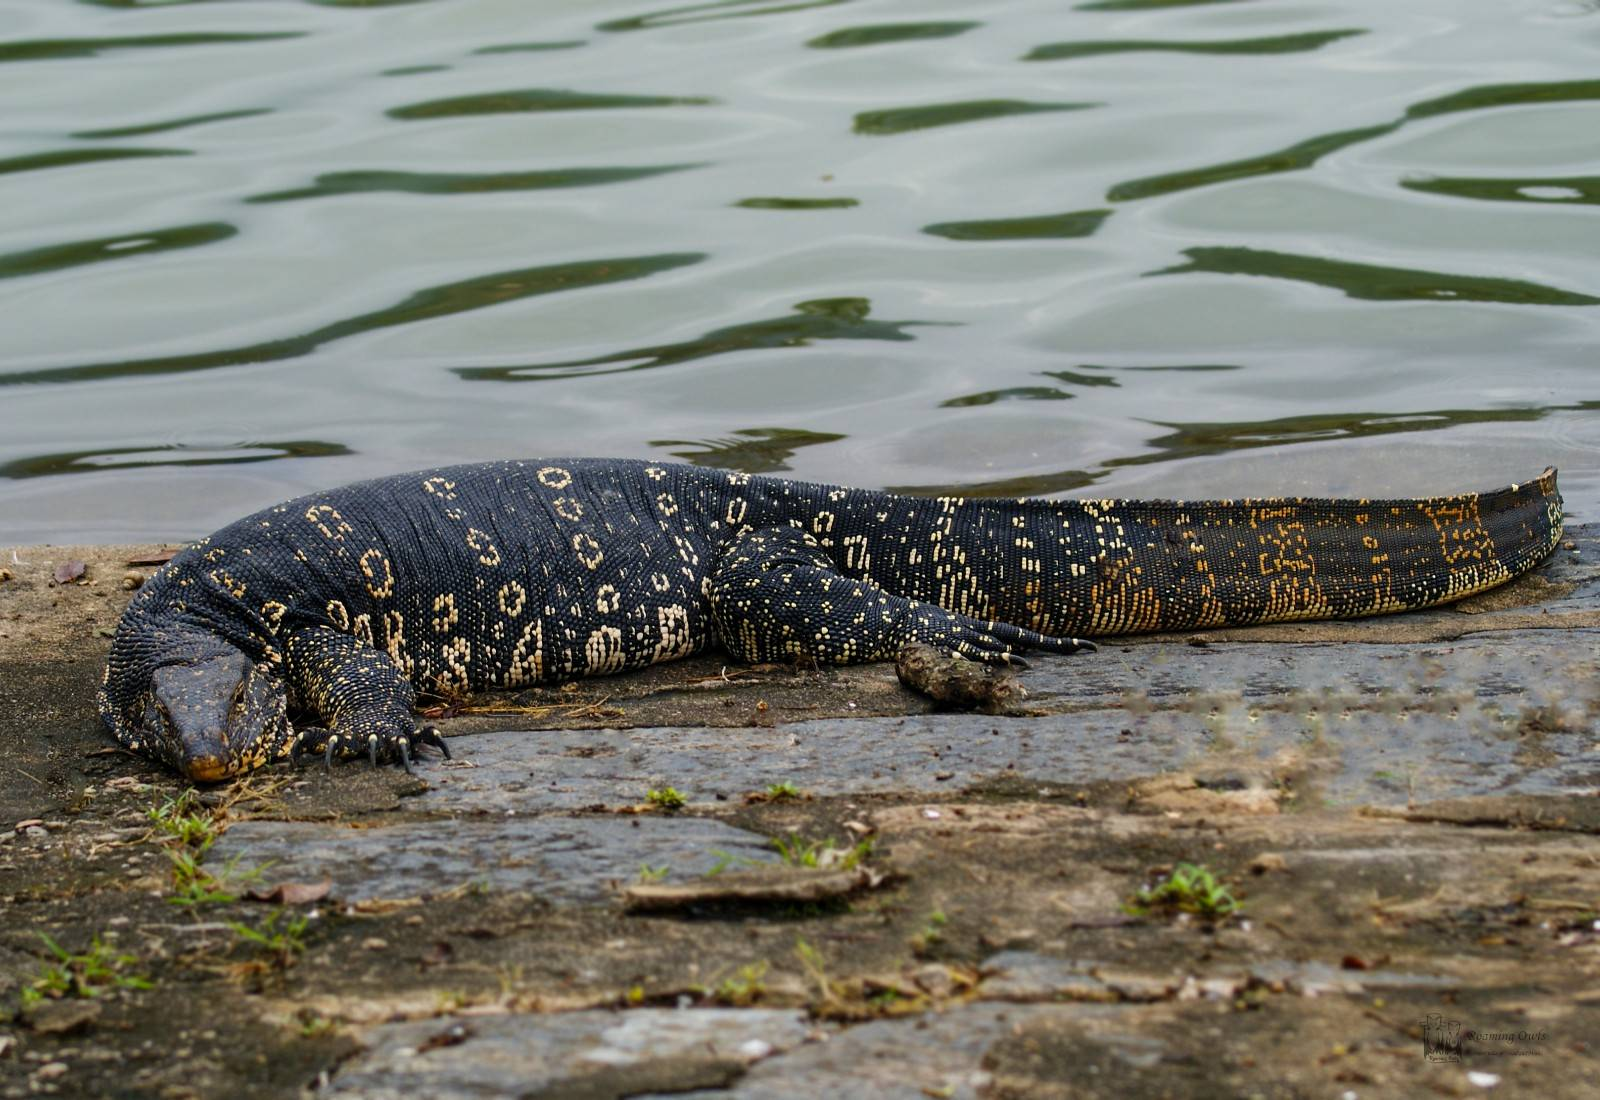 Srilanka,kandi,kandi river, காபரகோயா,Asian Water Monitor Lizard, Varanus salvator